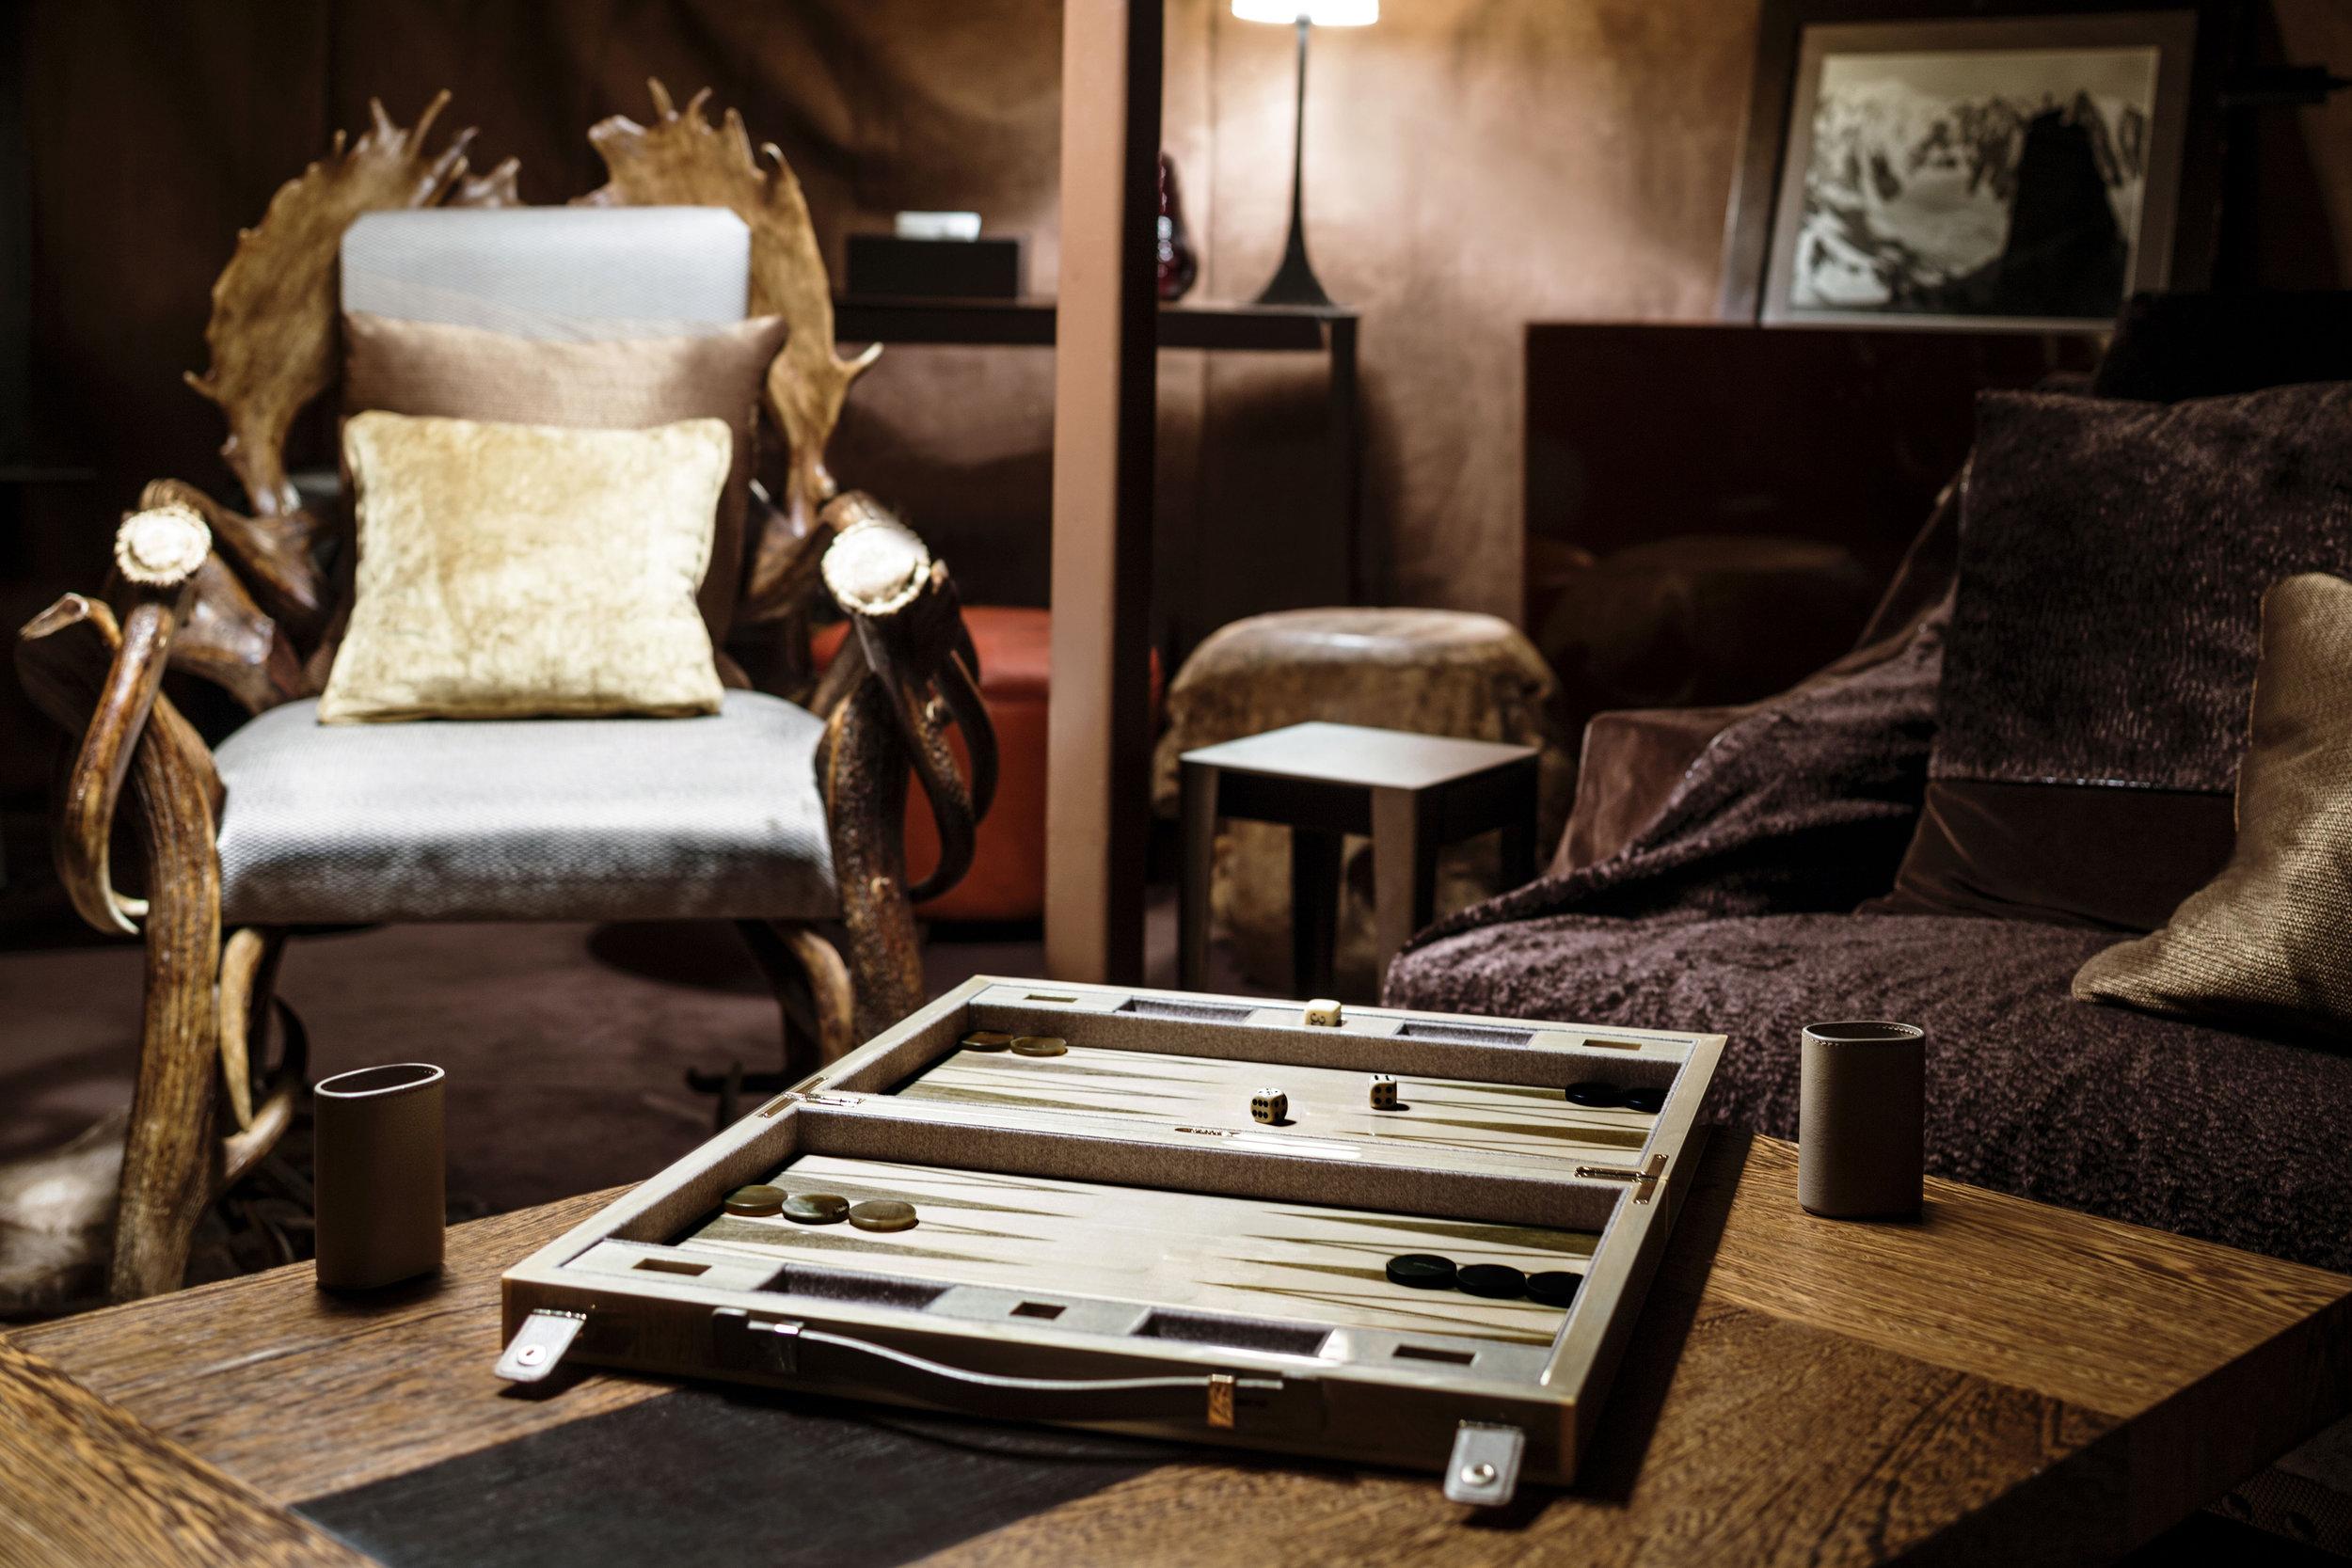 52-yourte-fumoir-backgammon-cigar-lounge-backgammon-s-candito.jpg